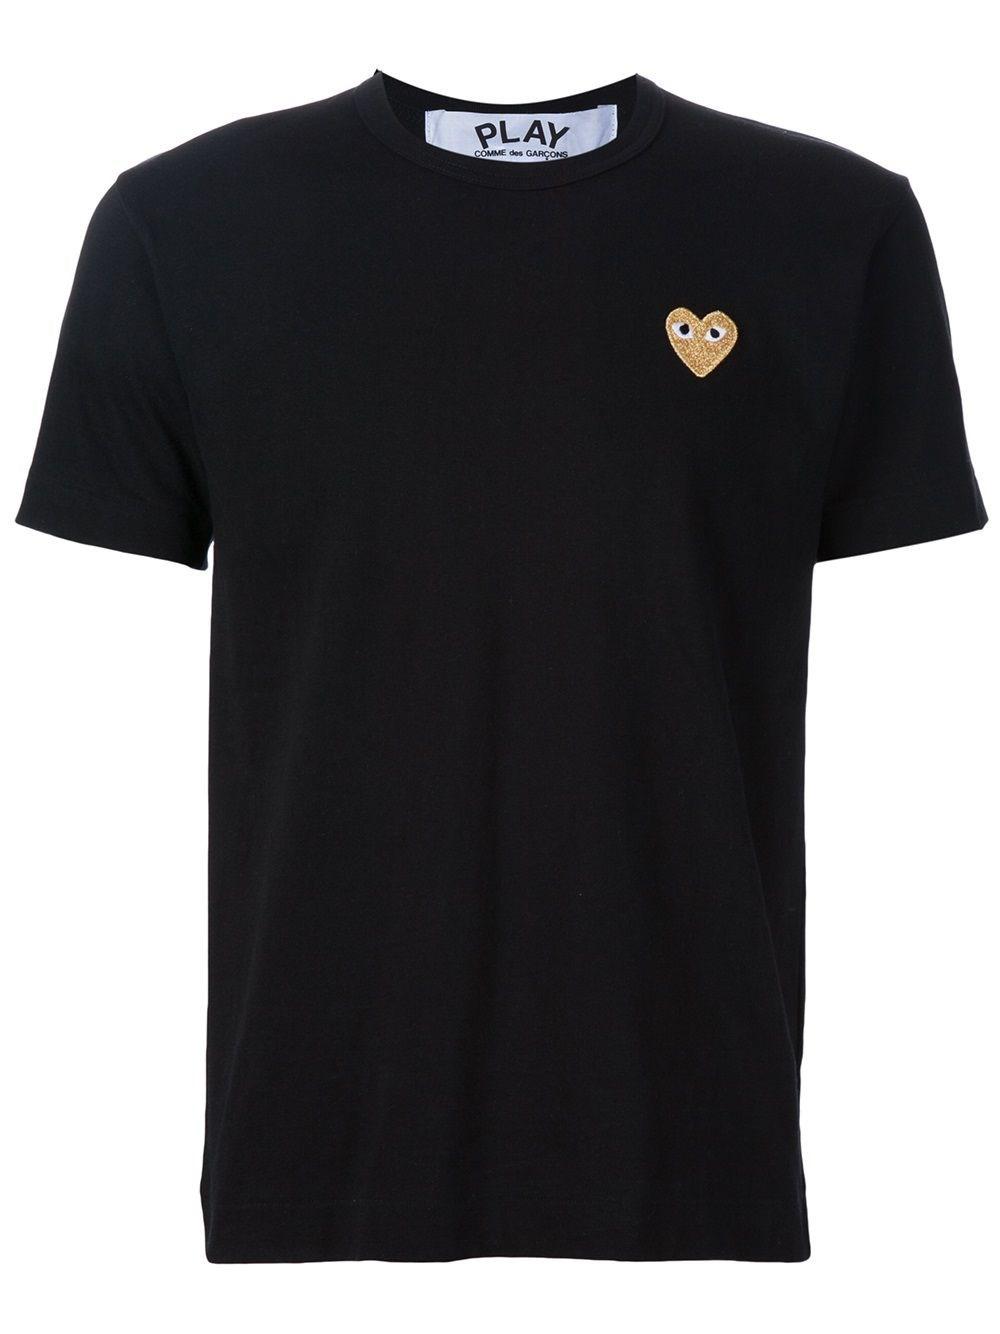 COMME DES GARCONS PLAY Golden Heart Patch T-Shirt